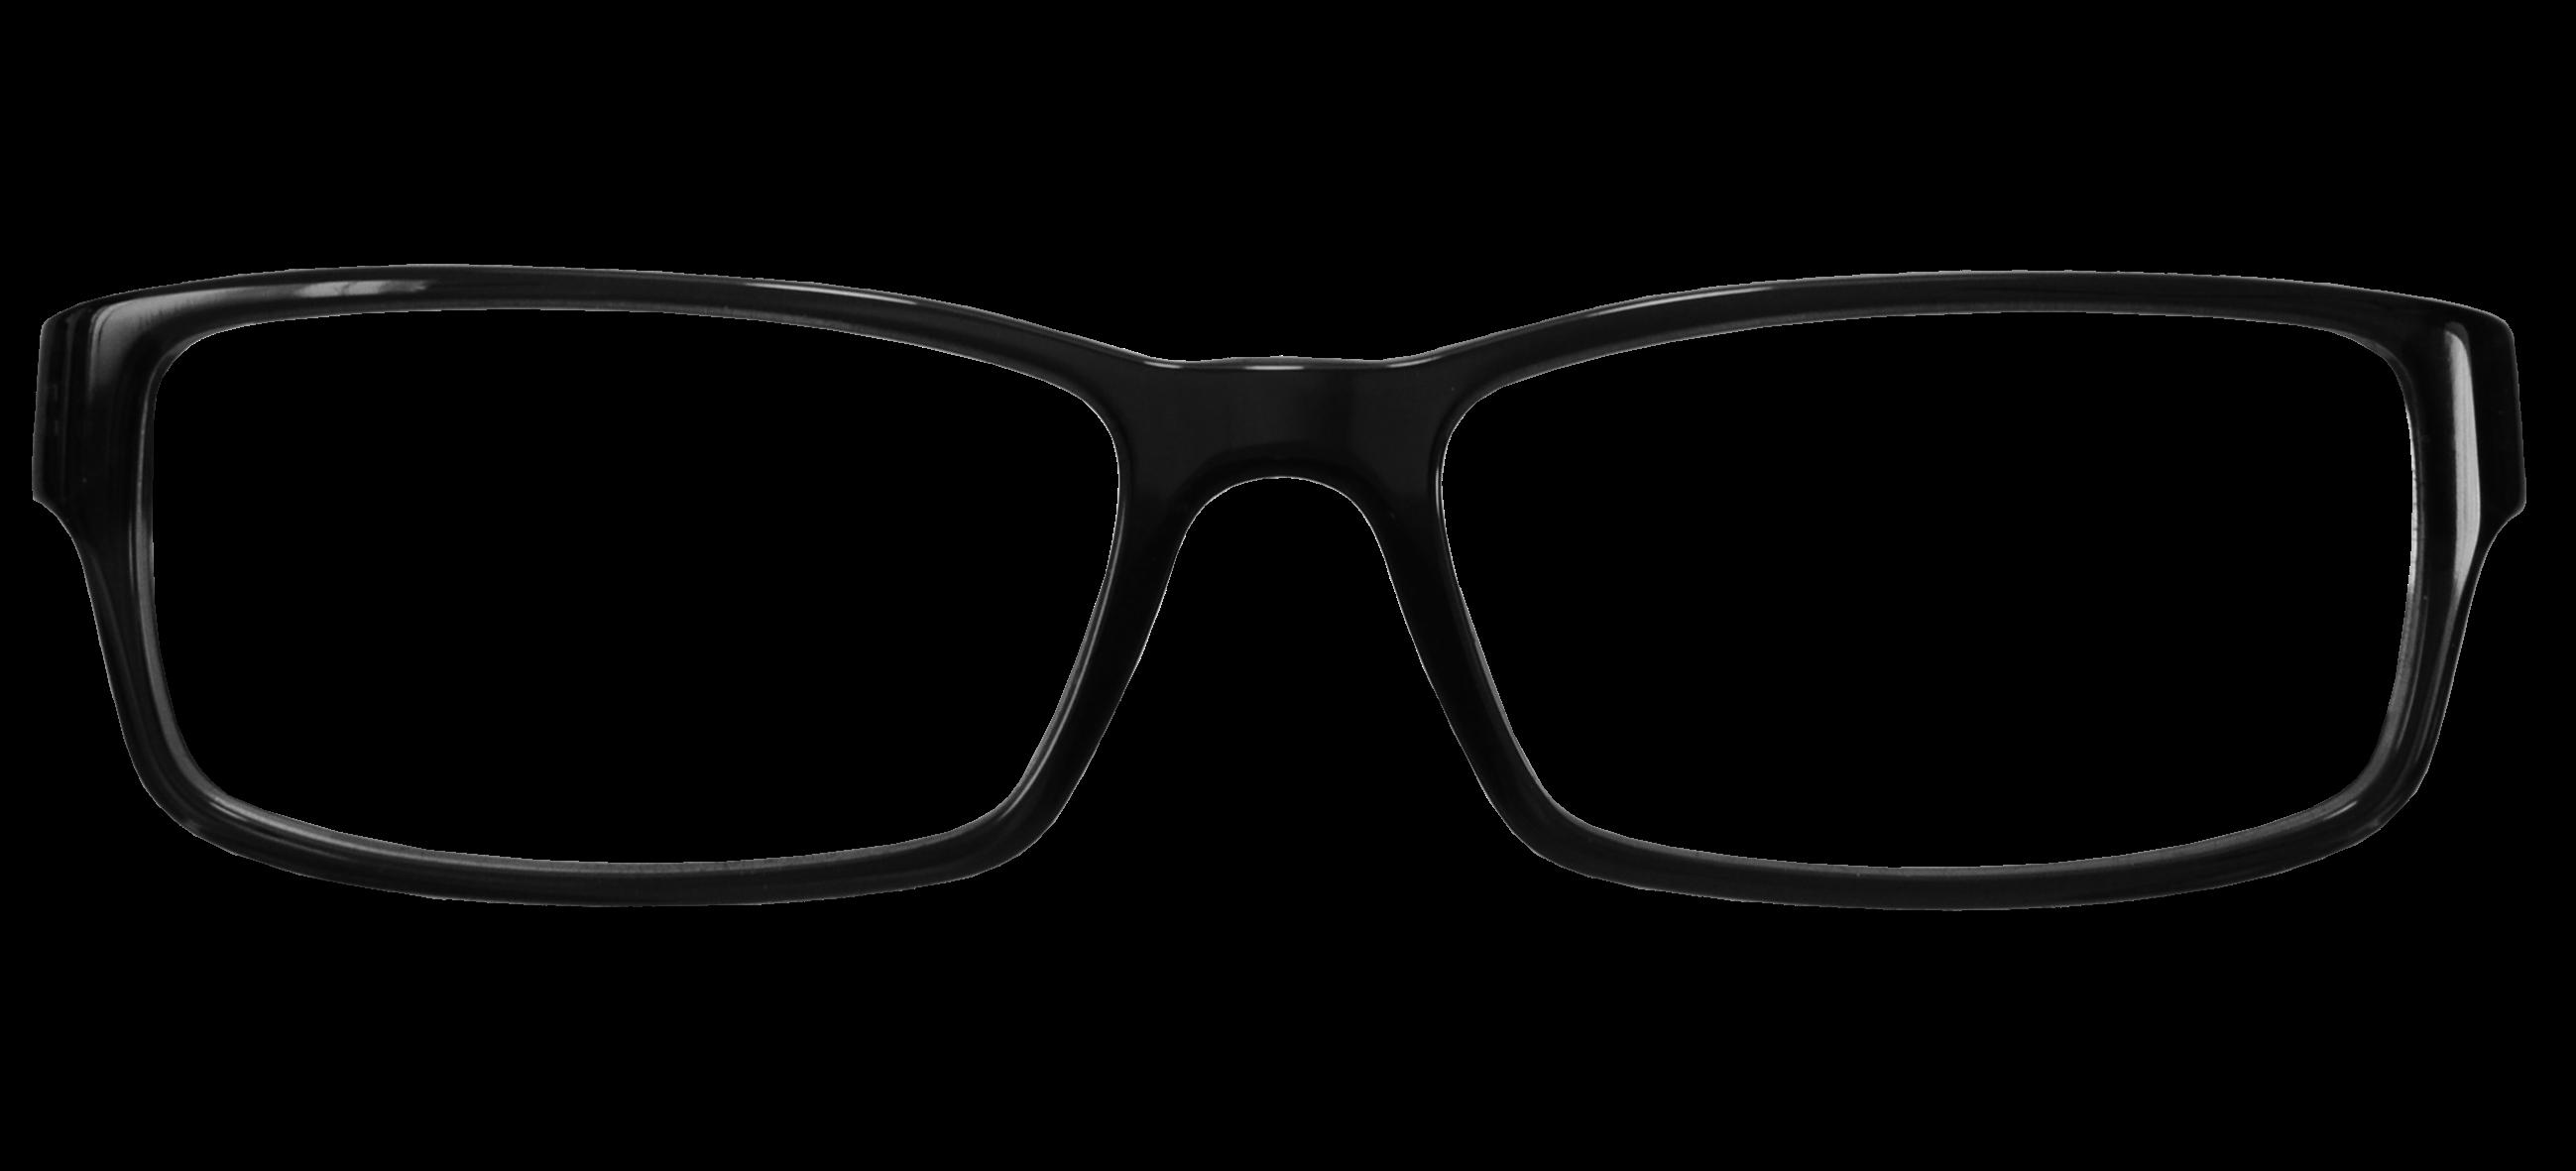 Aviator Sunglasses Ray Ban Clip Art Glasses Png Image Rayban Sunglasses Aviators Glasses Aviator Sunglasses